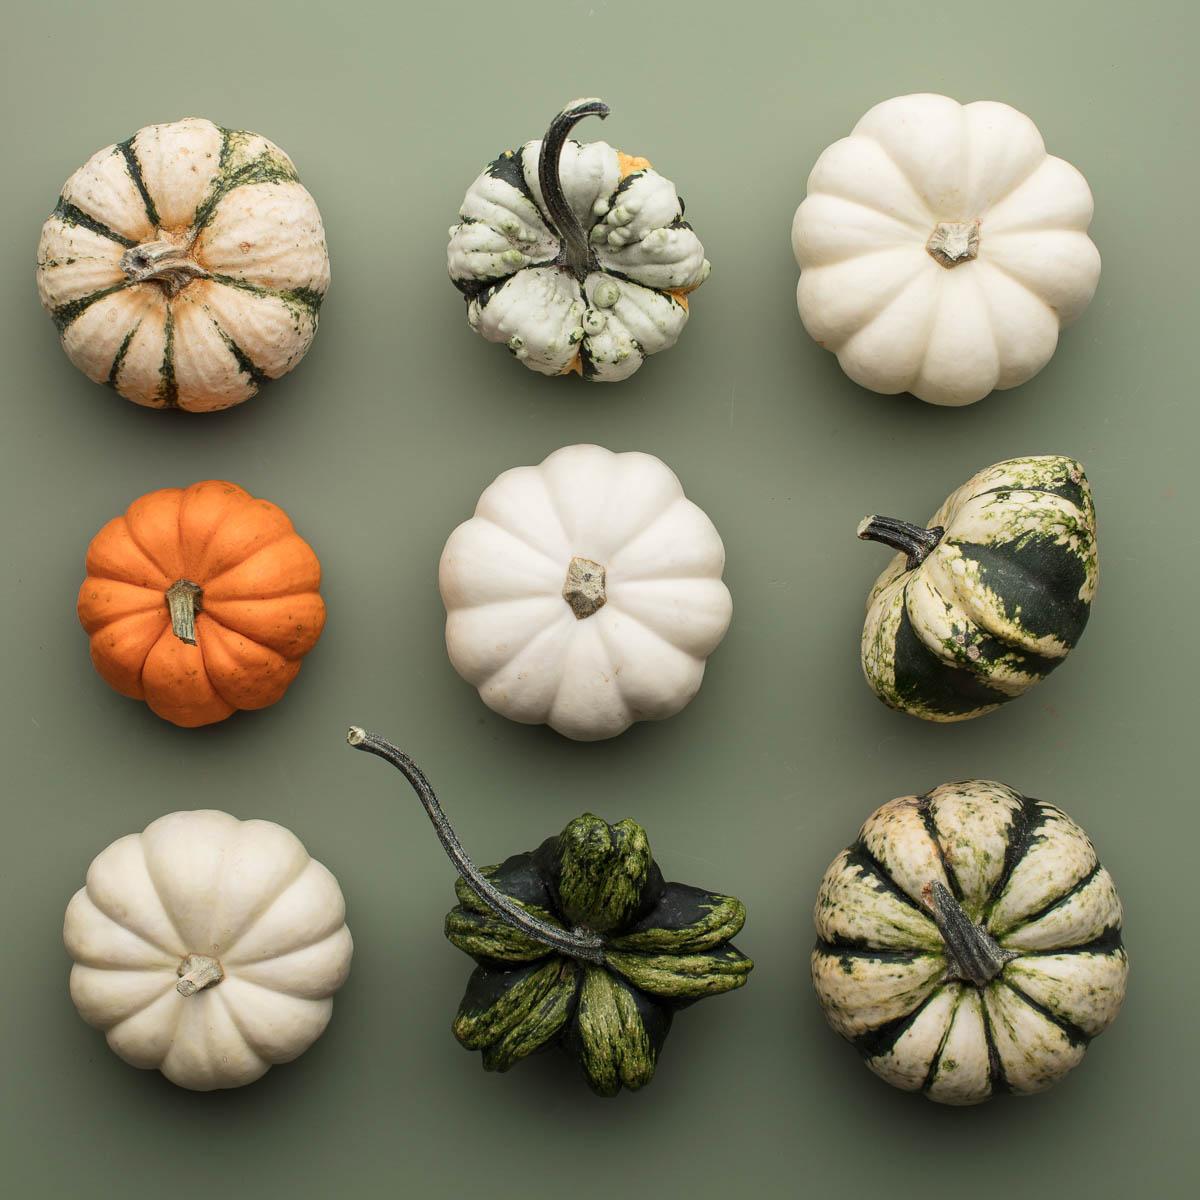 pyo-pumpkin-kent-pick-your-own-pumpkin-variety-green-support-local-magazine.JPG